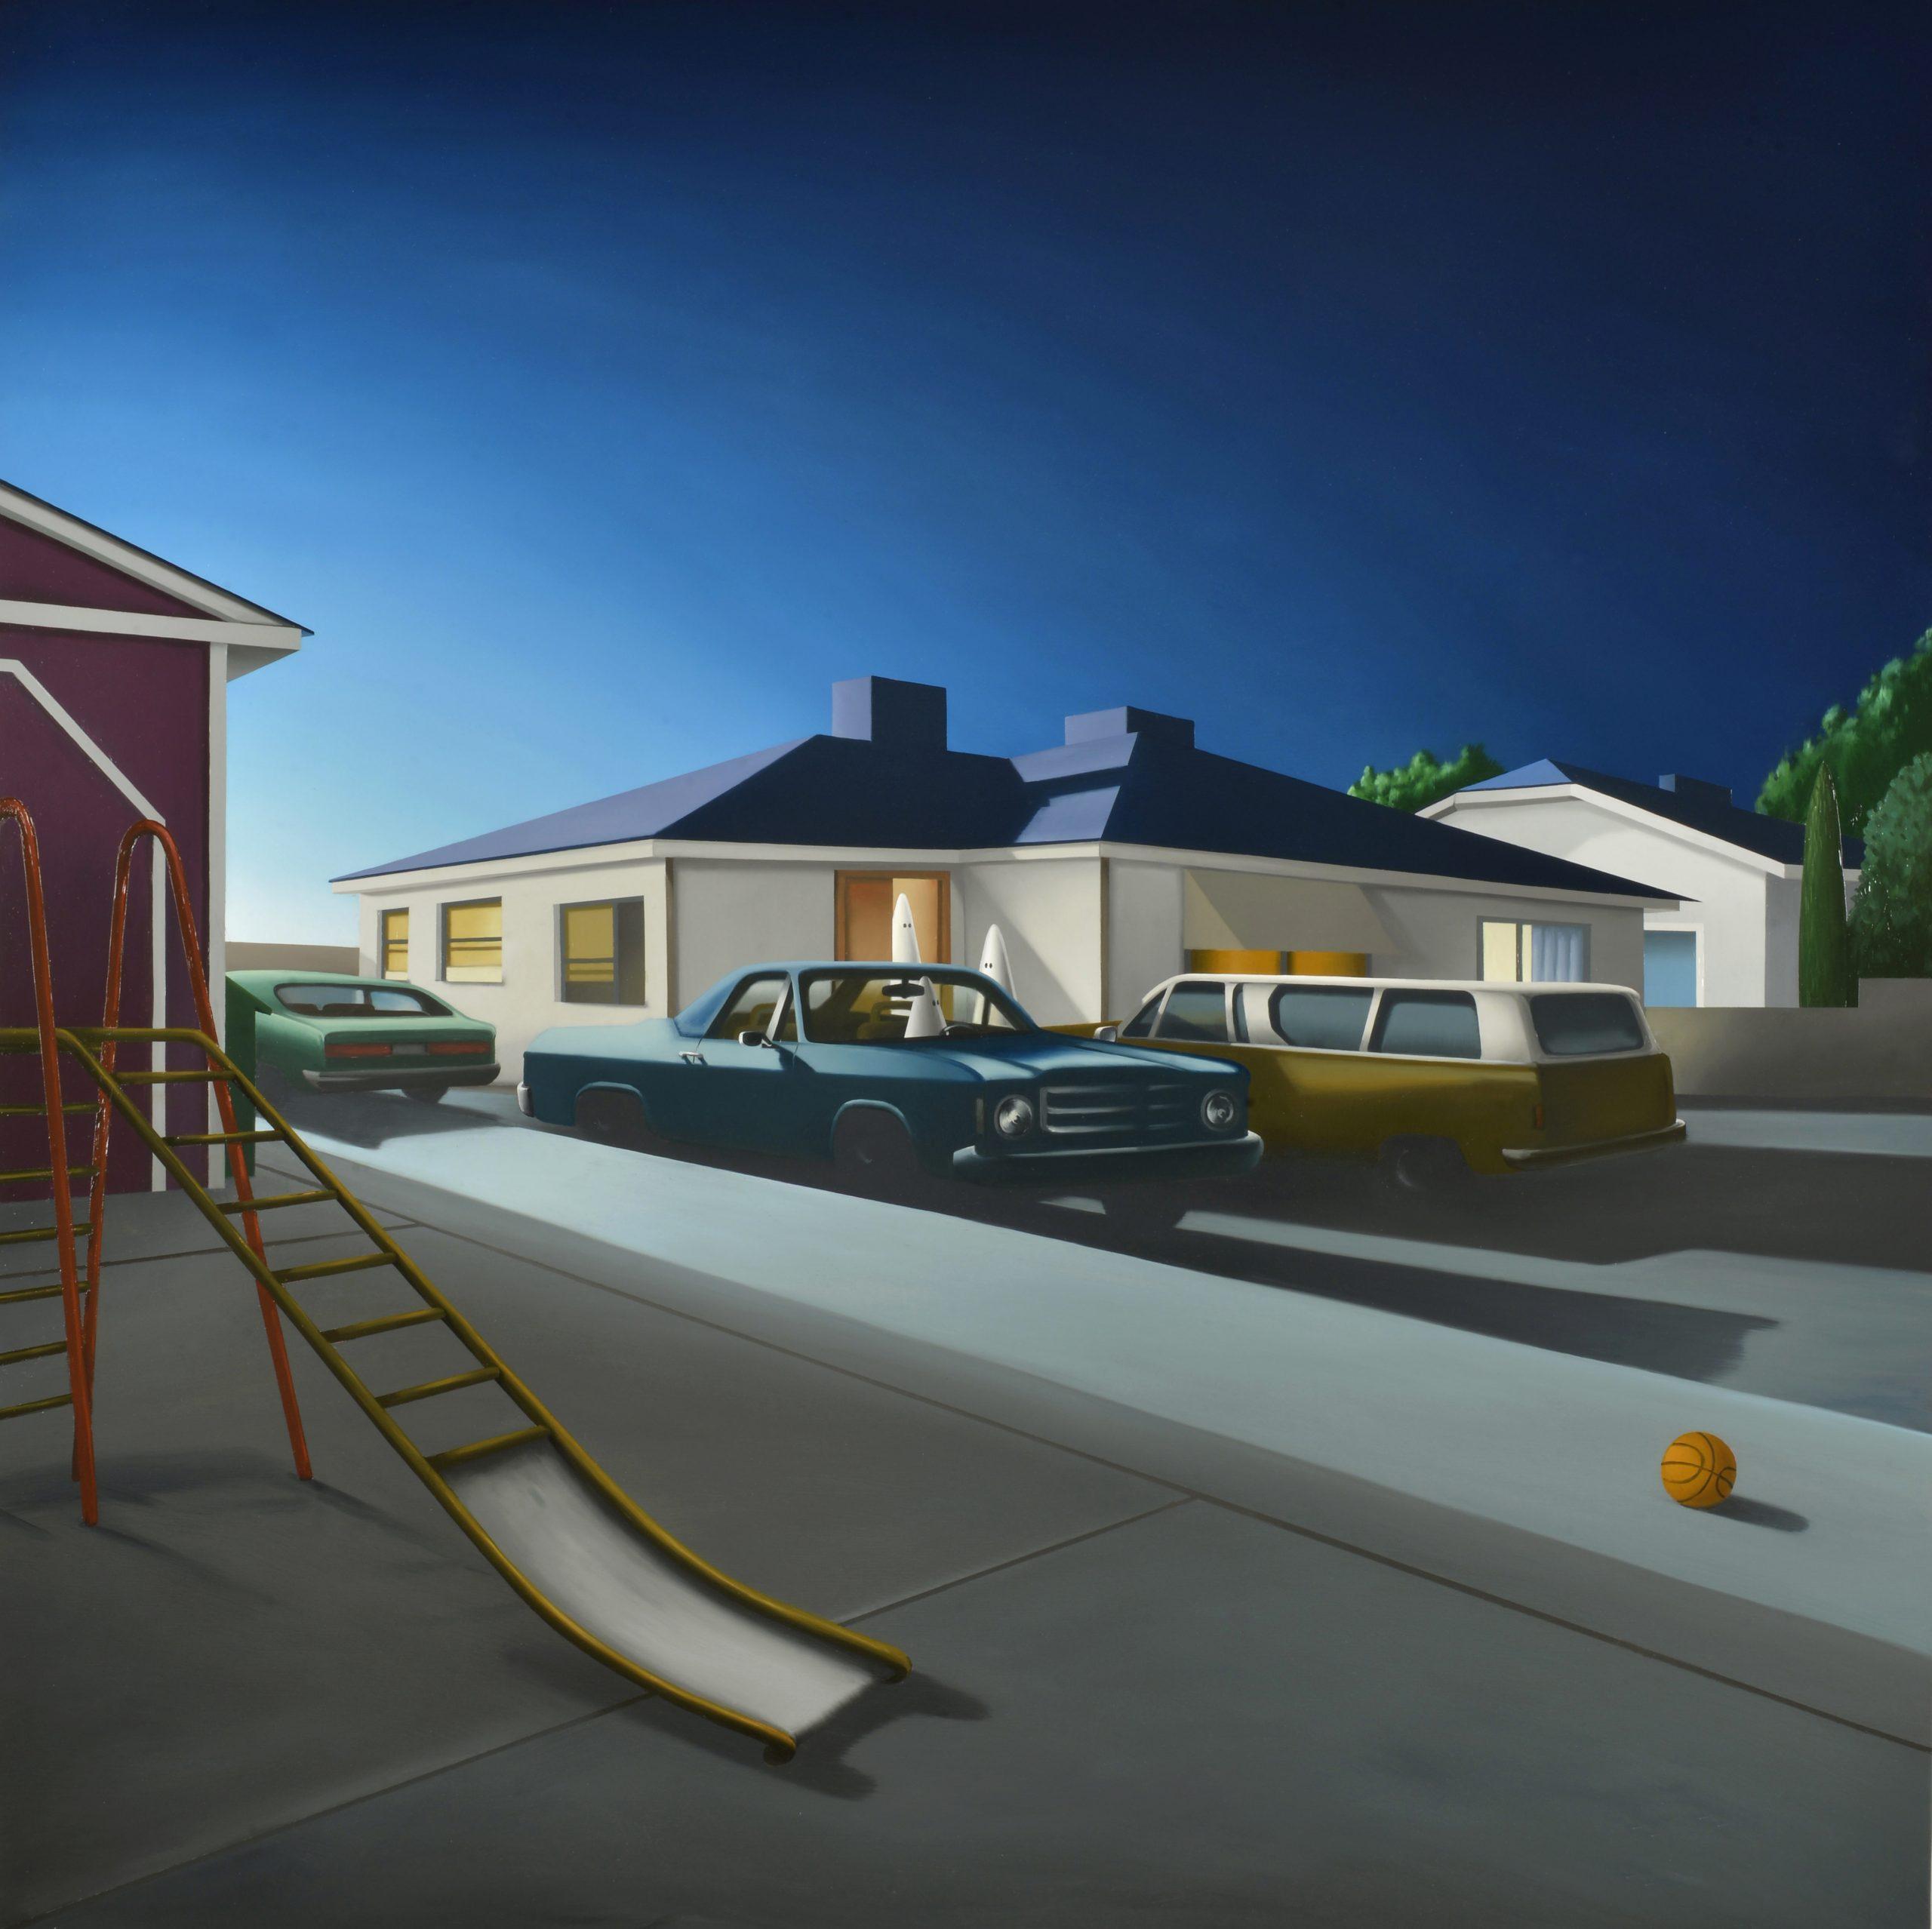 CU382 Small town 130x130 óleo sobre lienzo 2019